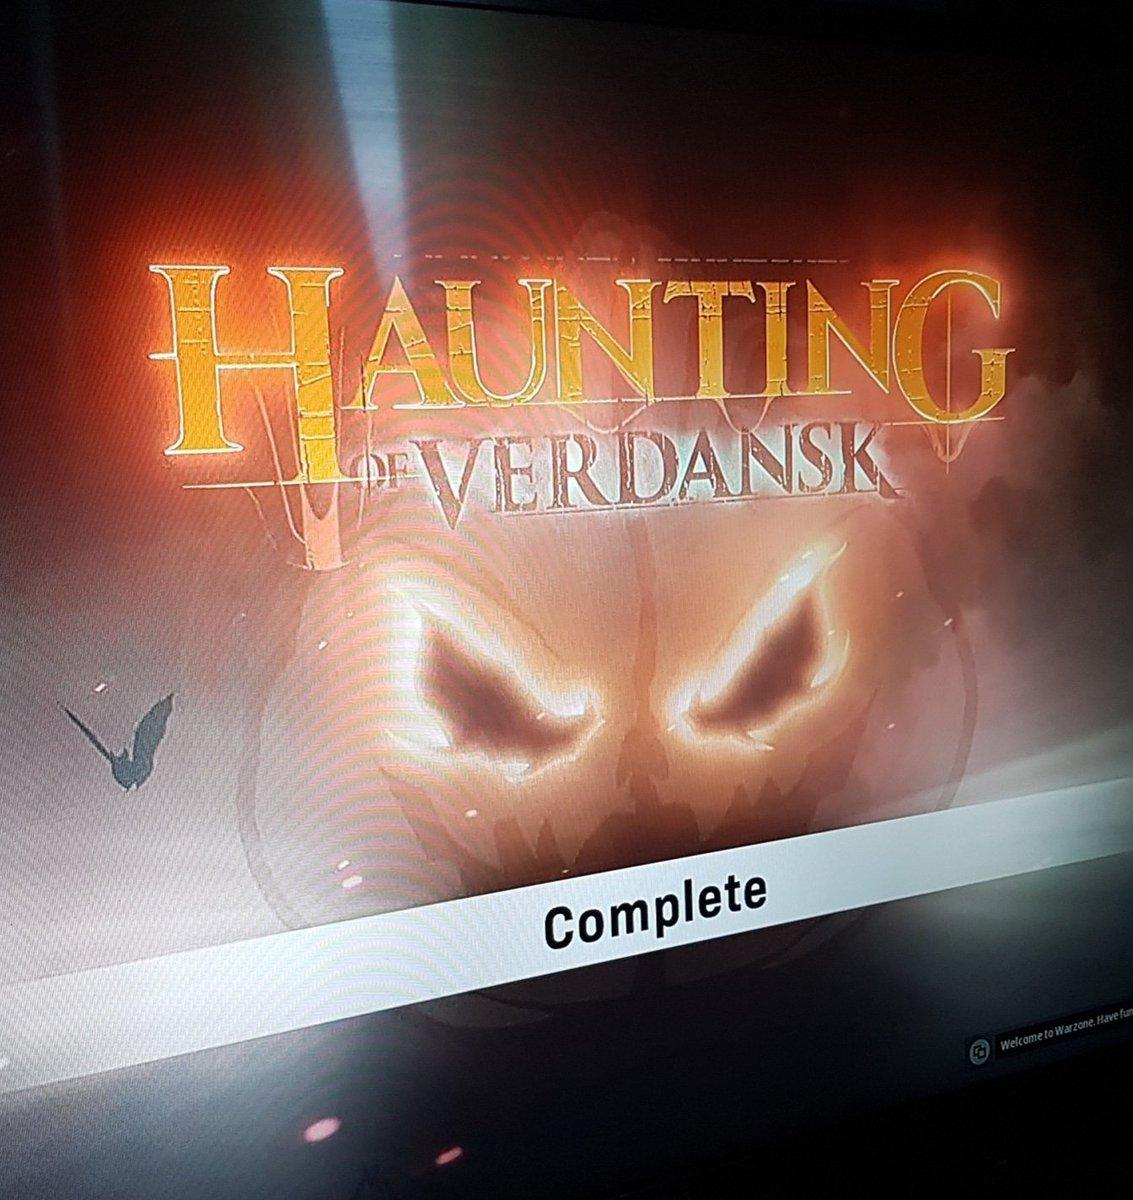 Finally The Haunting Of Verdansk is complete 😌 #warzone #mordernwarfare #halloweenseason #halloweenevent #xboxone #night #zombies https://t.co/SmY2UurSNd